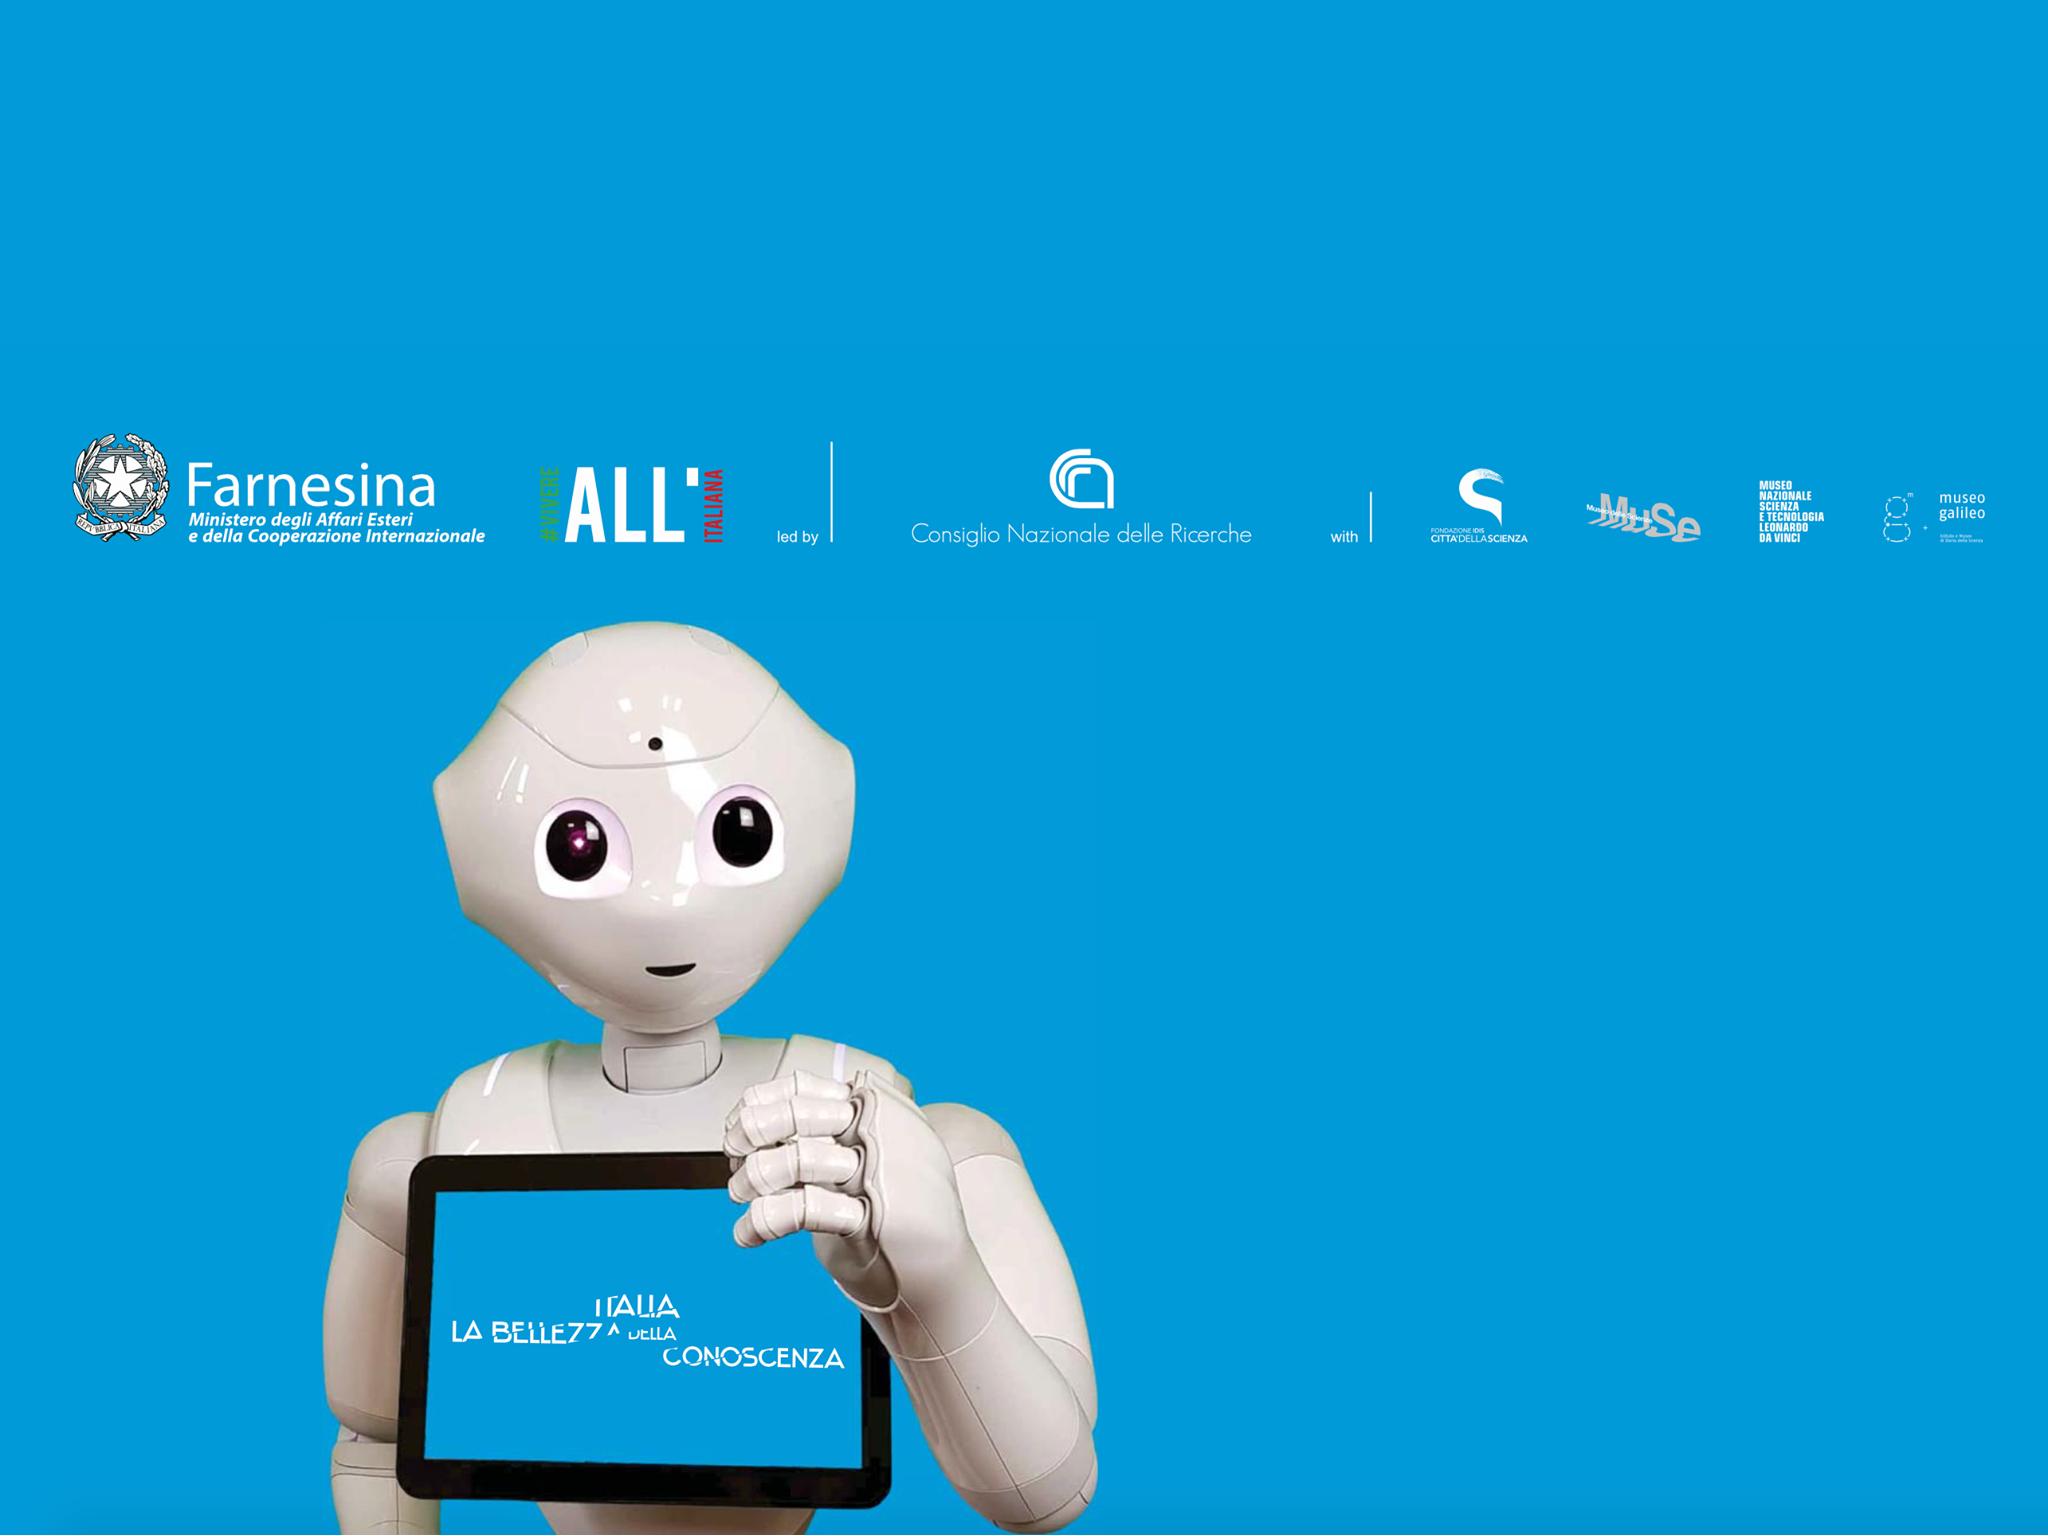 L'ICAR E I Suoi Robot Alla Farnesina